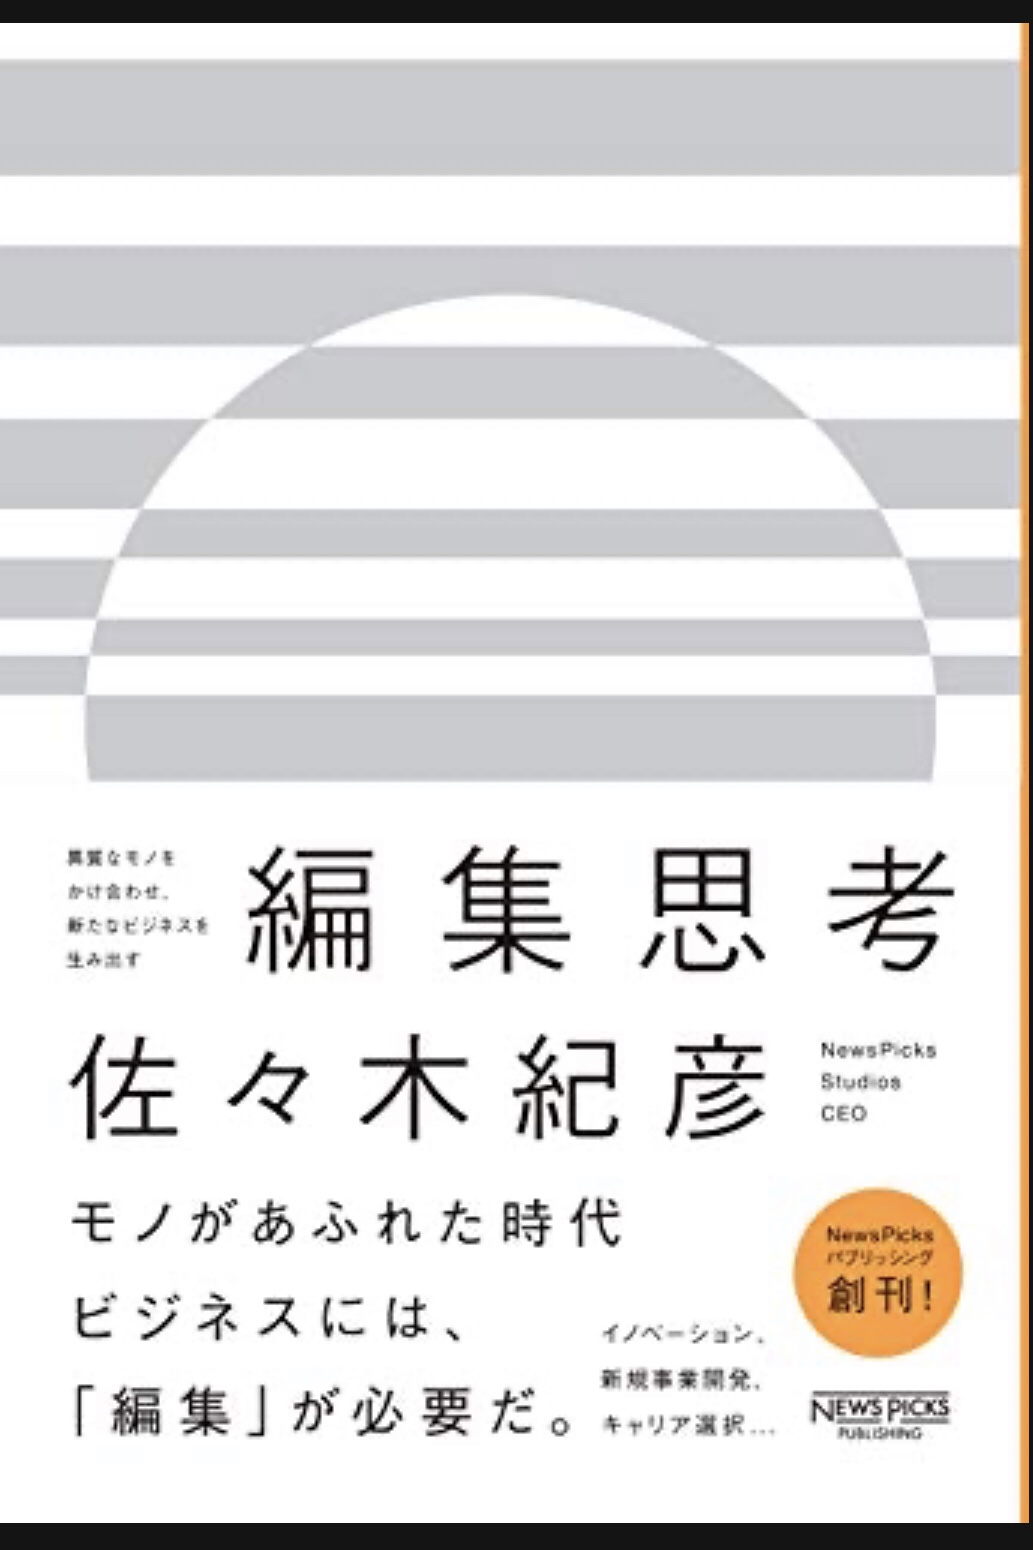 <書籍を知る>『編集思考 』佐々木紀彦